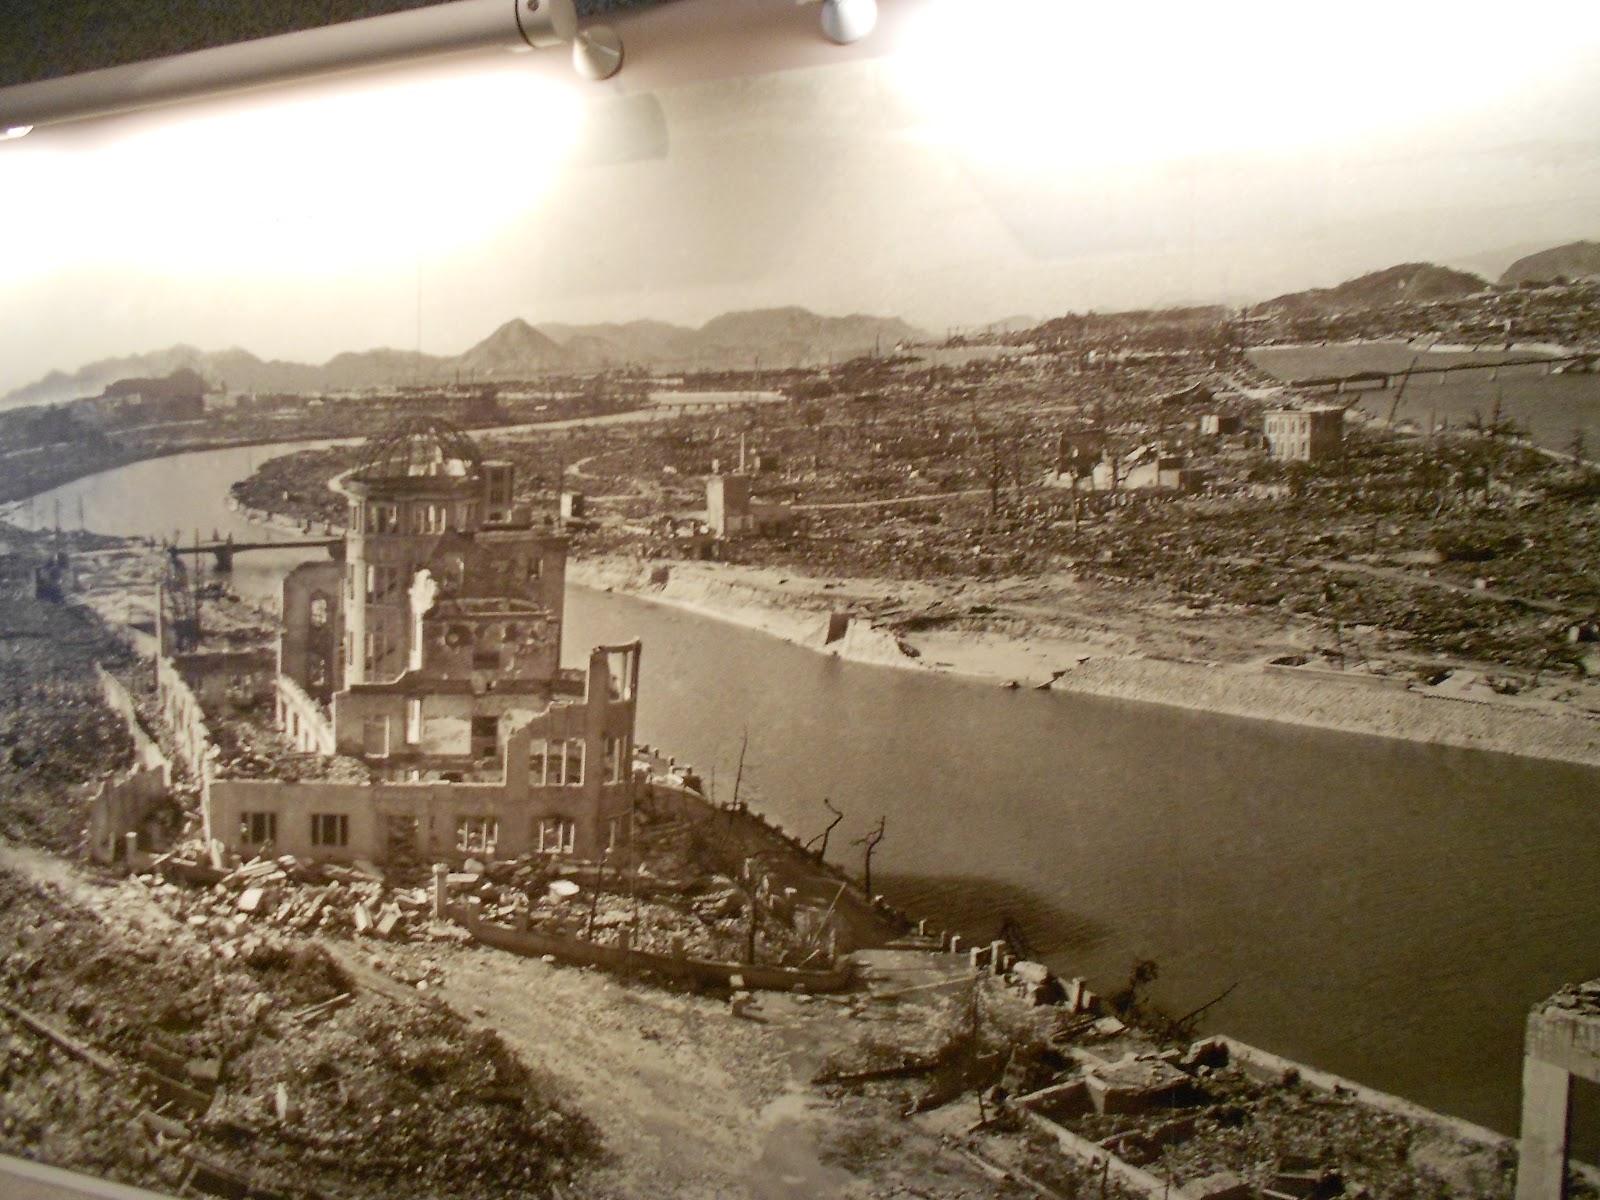 Tess' Japan Travel Blog!: Japan Day 4, Hiroshima And Miyajima